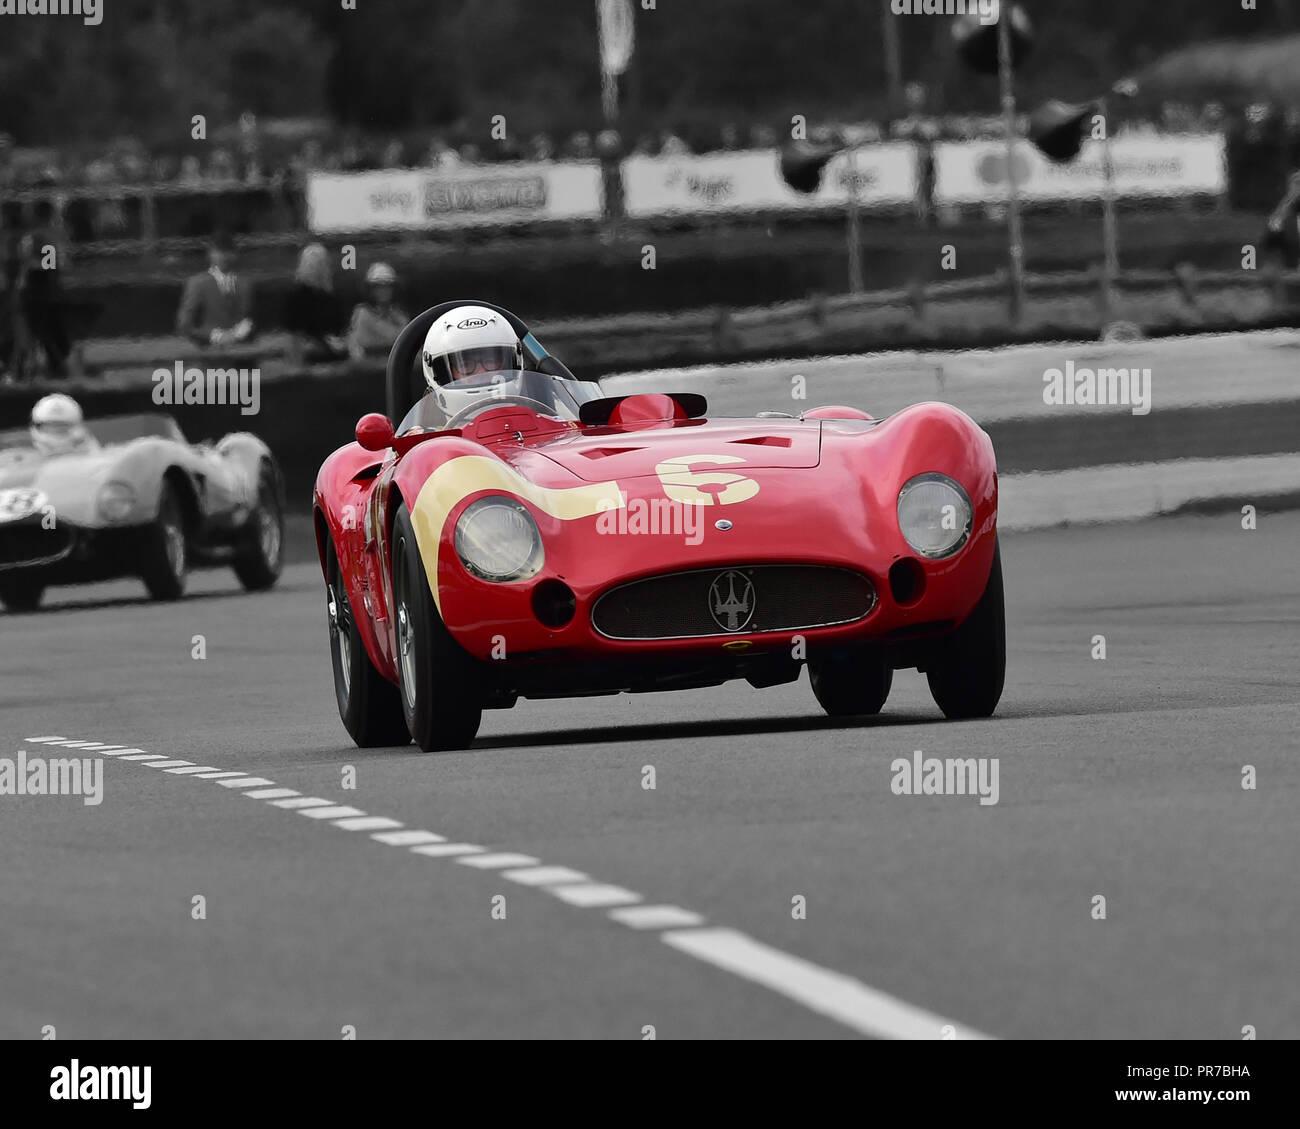 Carlo Vogele, Maserati 300S, Freddie März Memorial Trophy, Sportwagen, 1952 bis 1955, Goodwood Revival 2018, September 2018, Automobile, Autos, Circus Stockbild